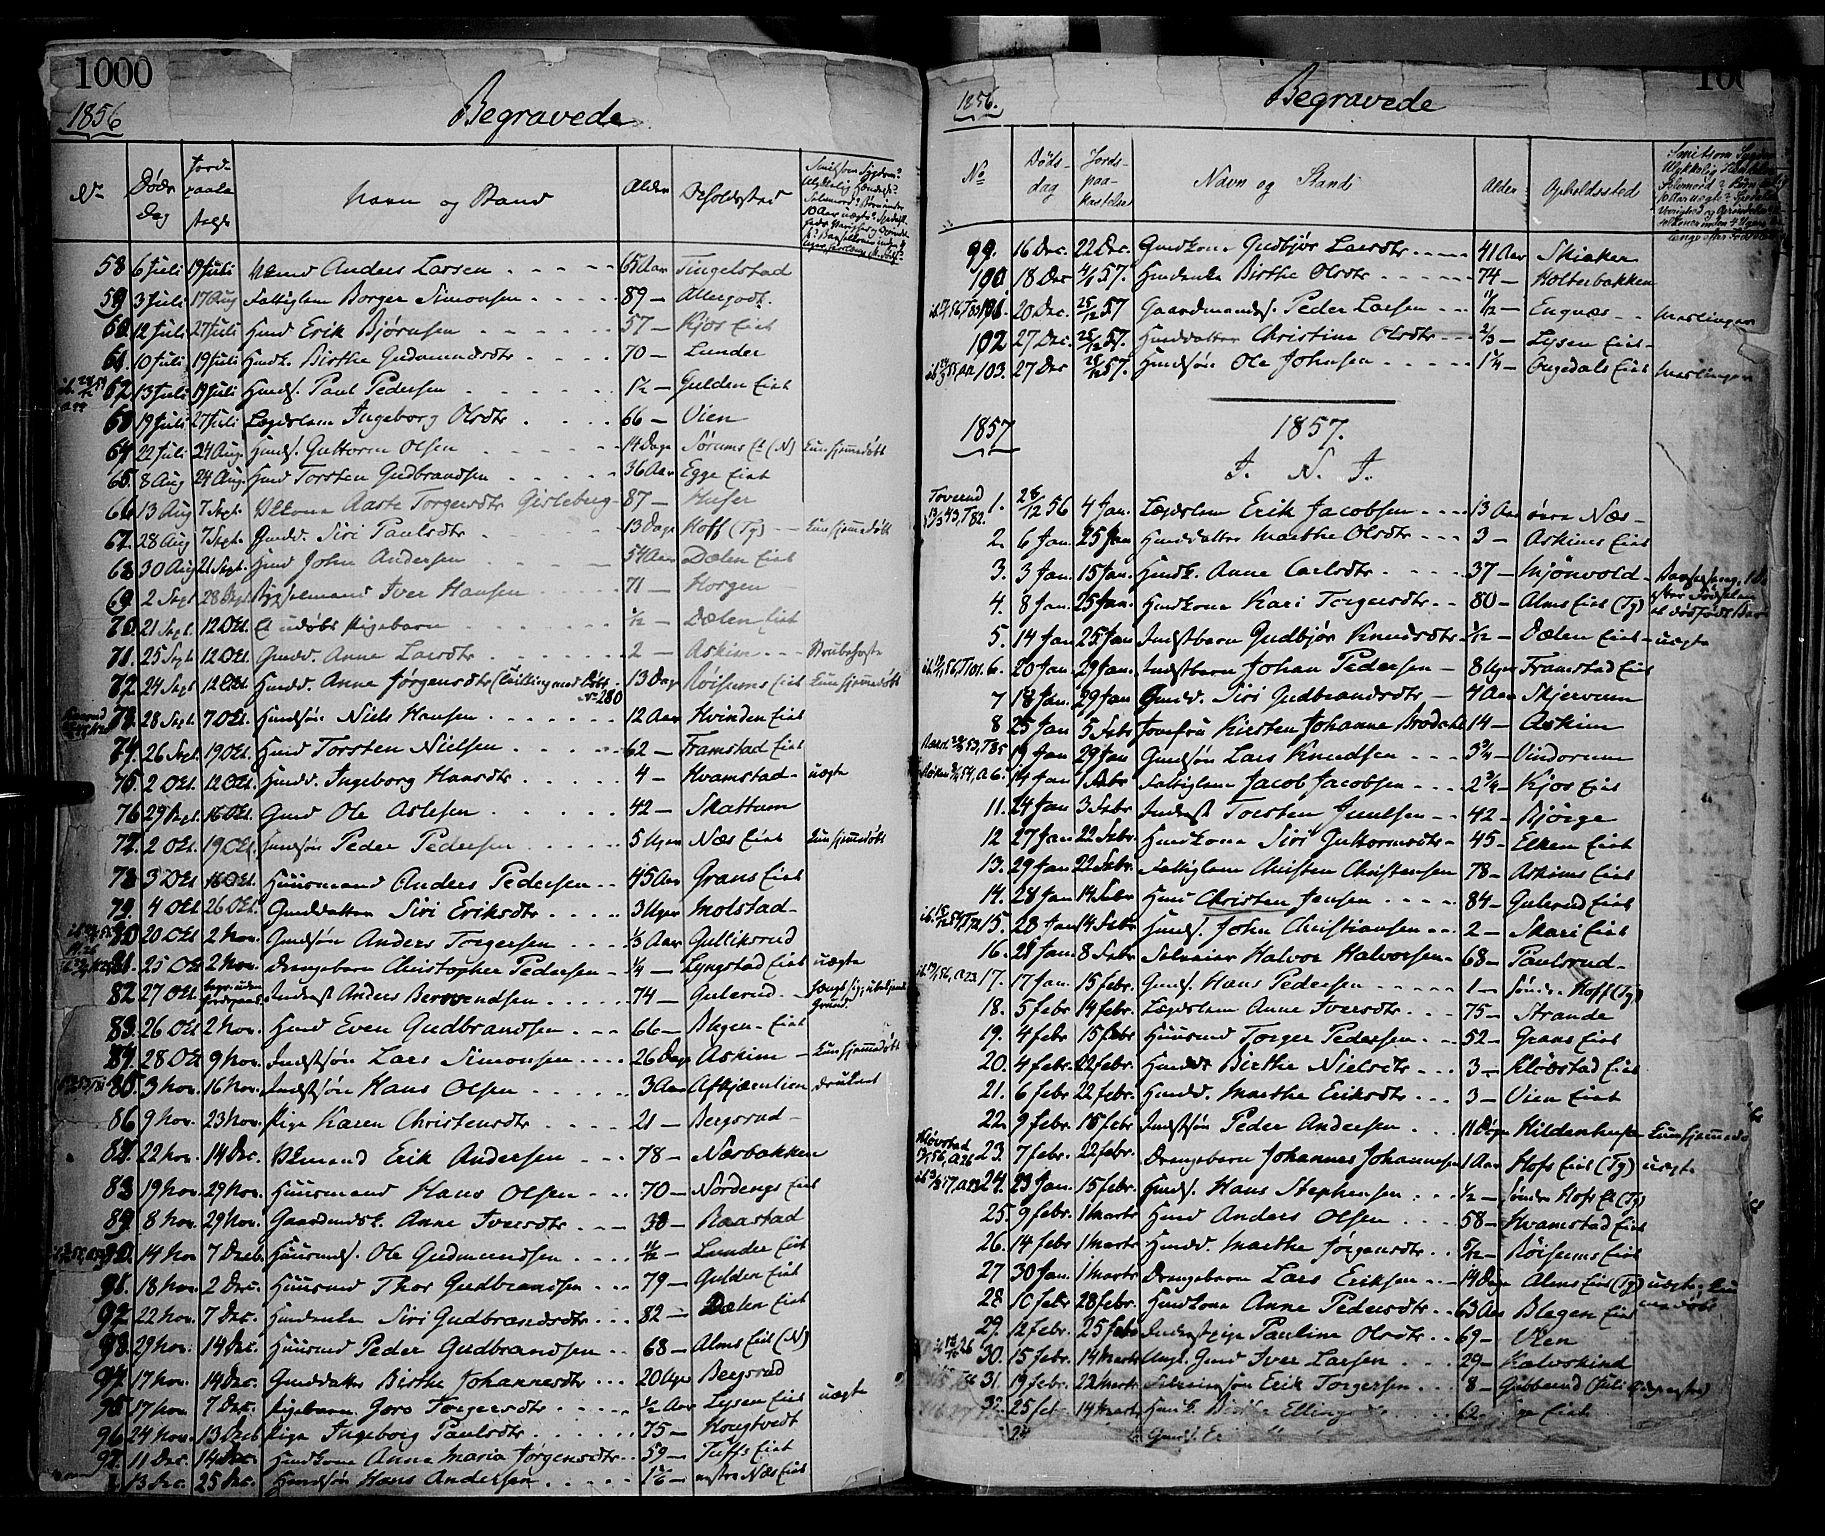 SAH, Gran prestekontor, Ministerialbok nr. 12, 1856-1874, s. 1000-1001